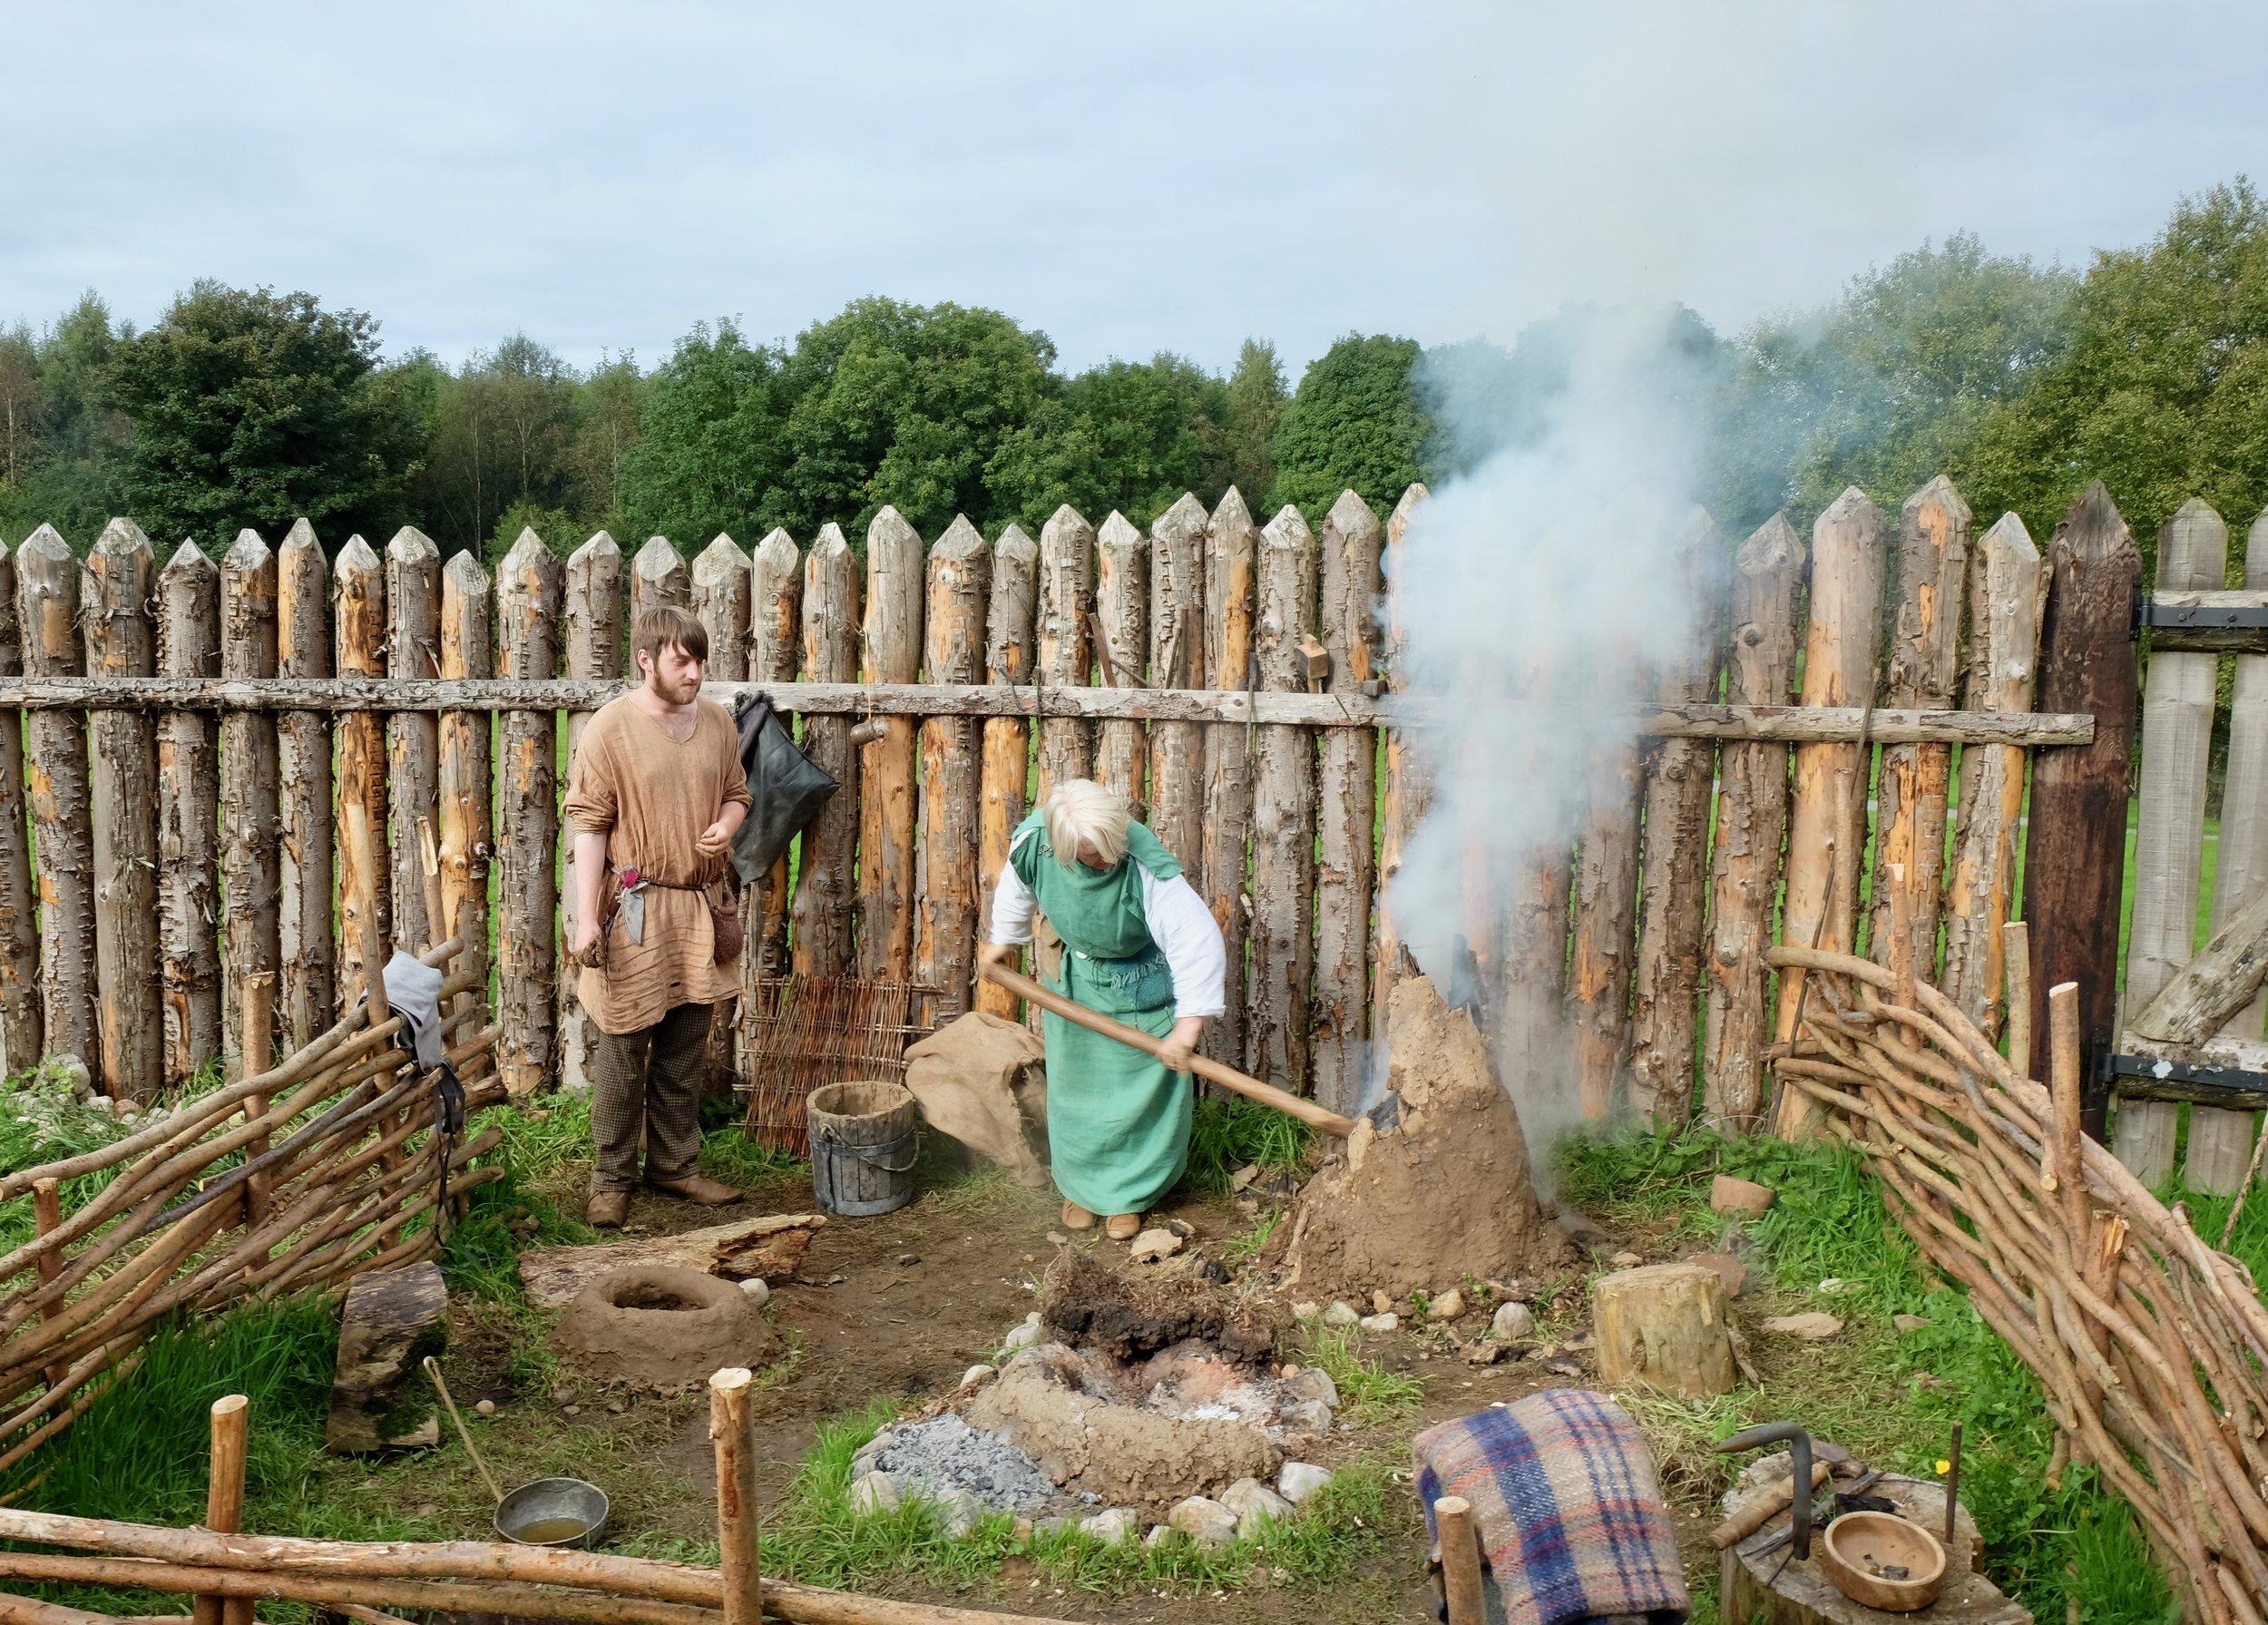 Teaching us how to make charcoal.